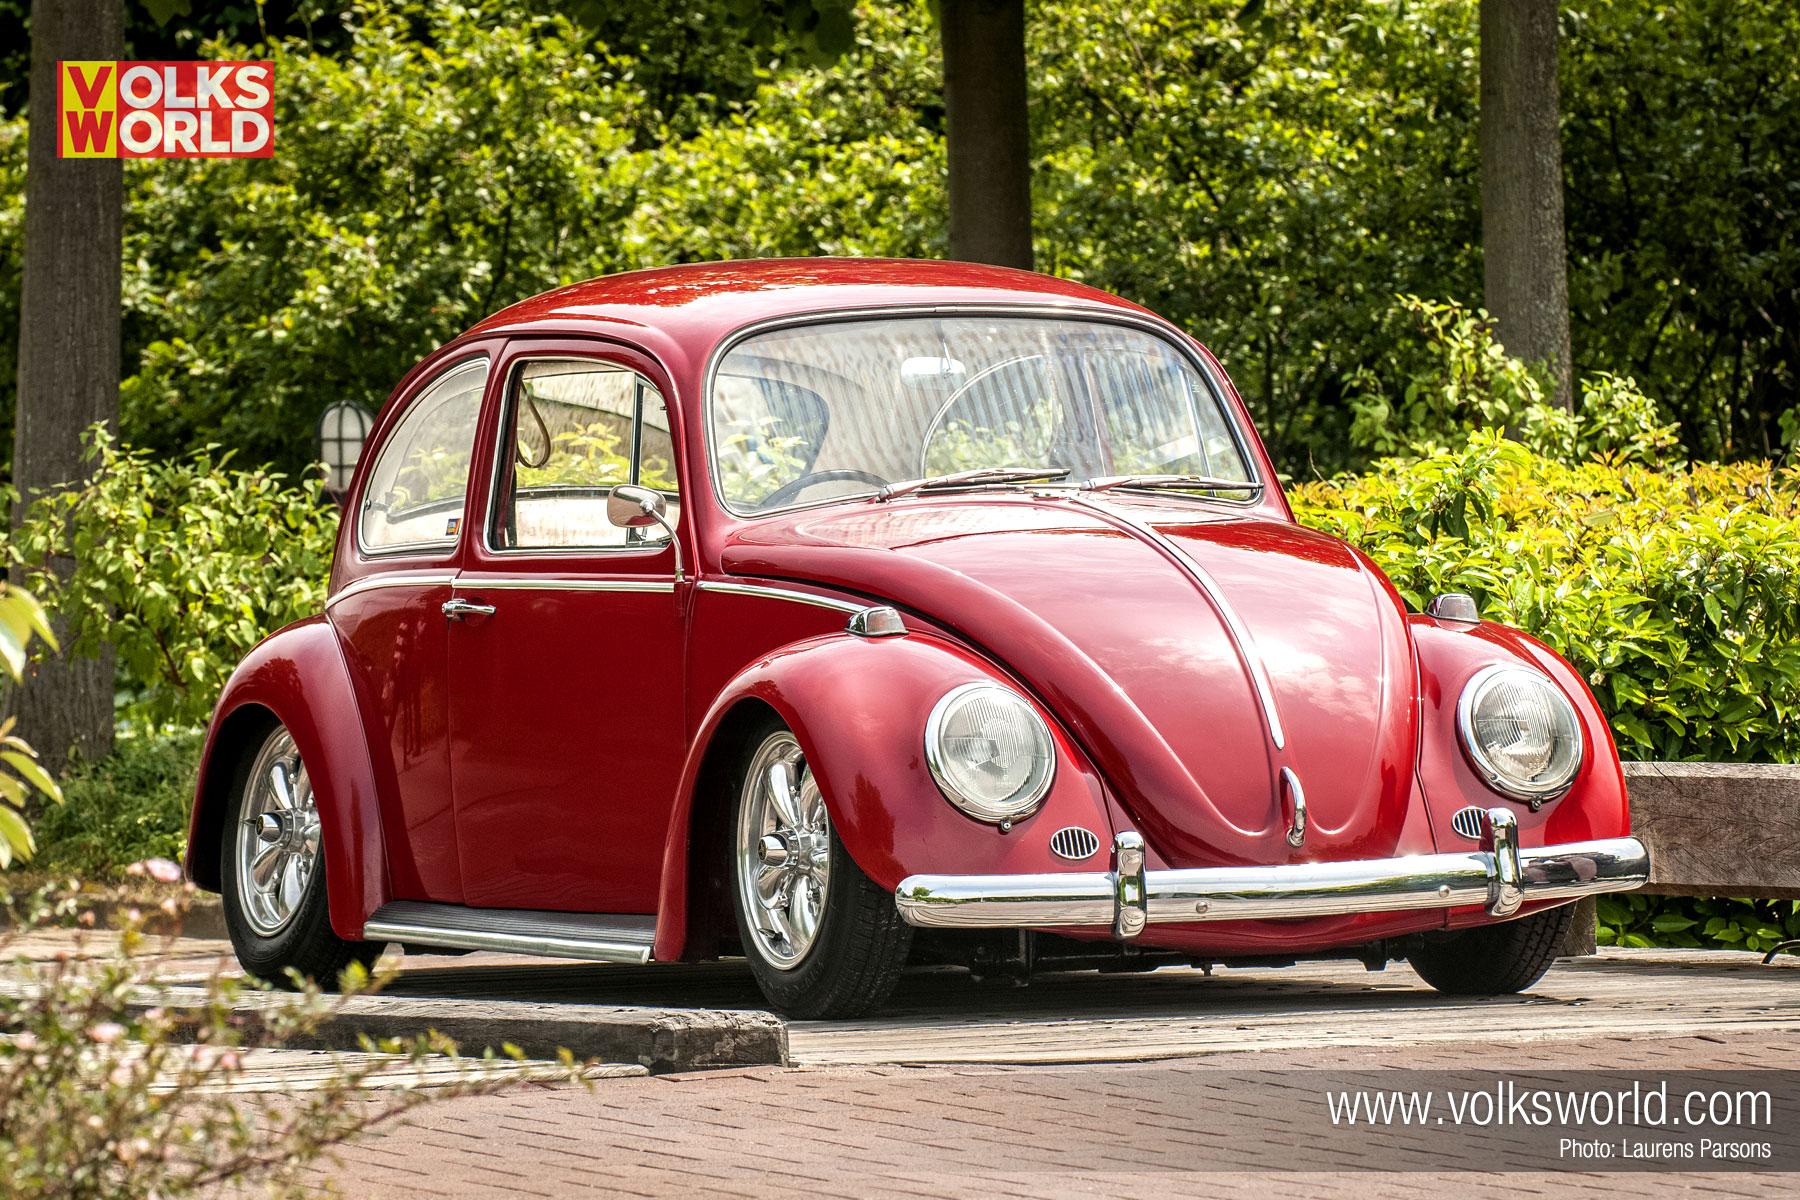 VW Wallpaper Sept 13 22 1800x1200